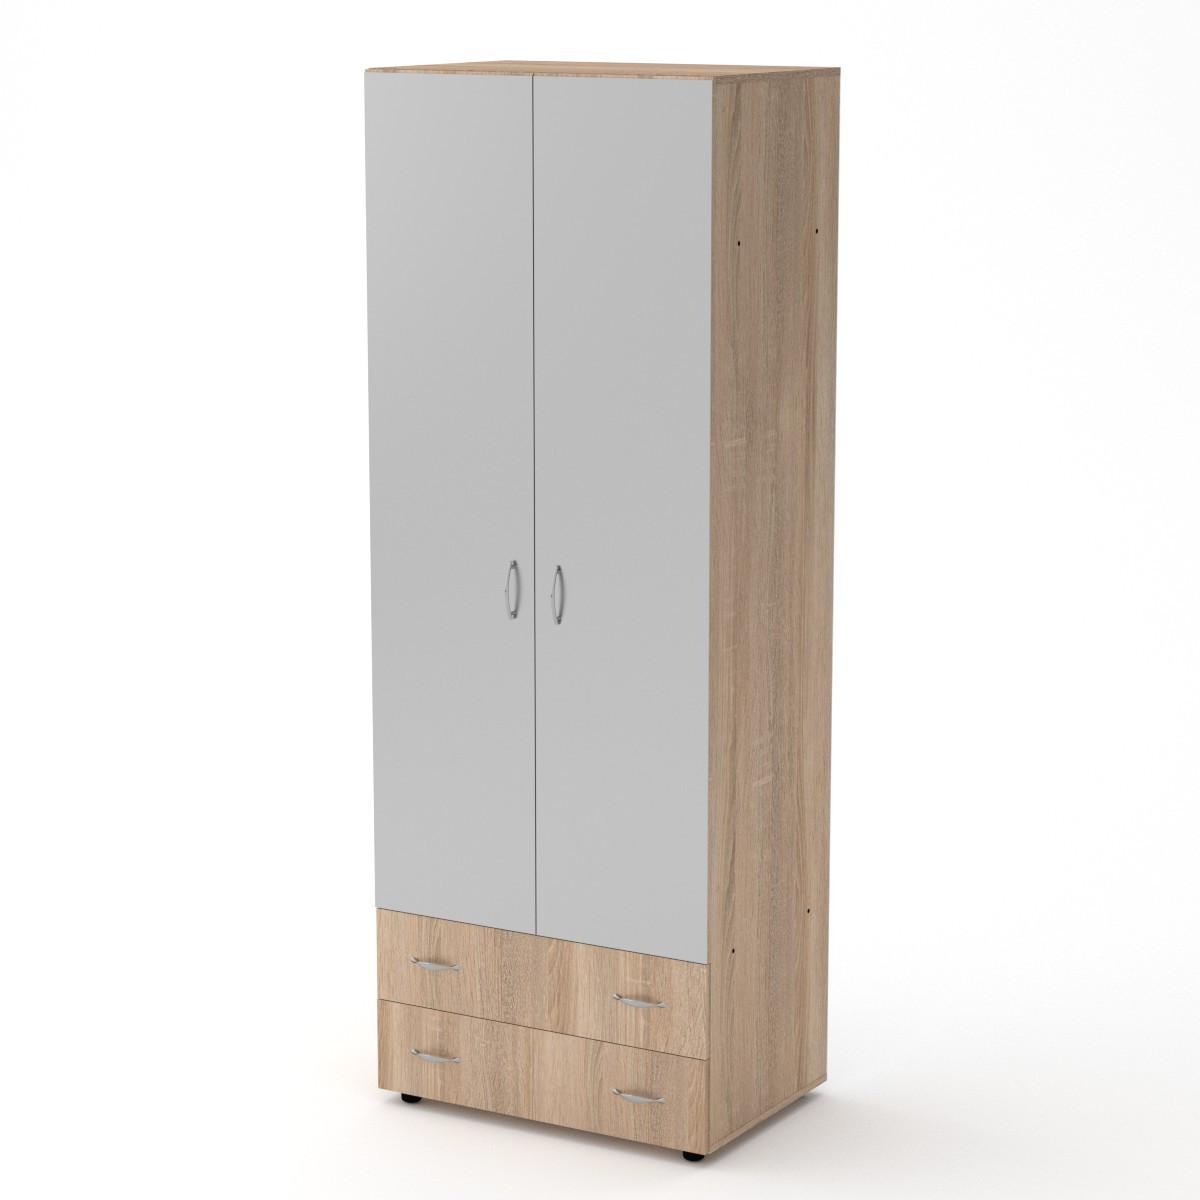 Шкаф-5 дуб сонома Компанит (80х54х218 см)